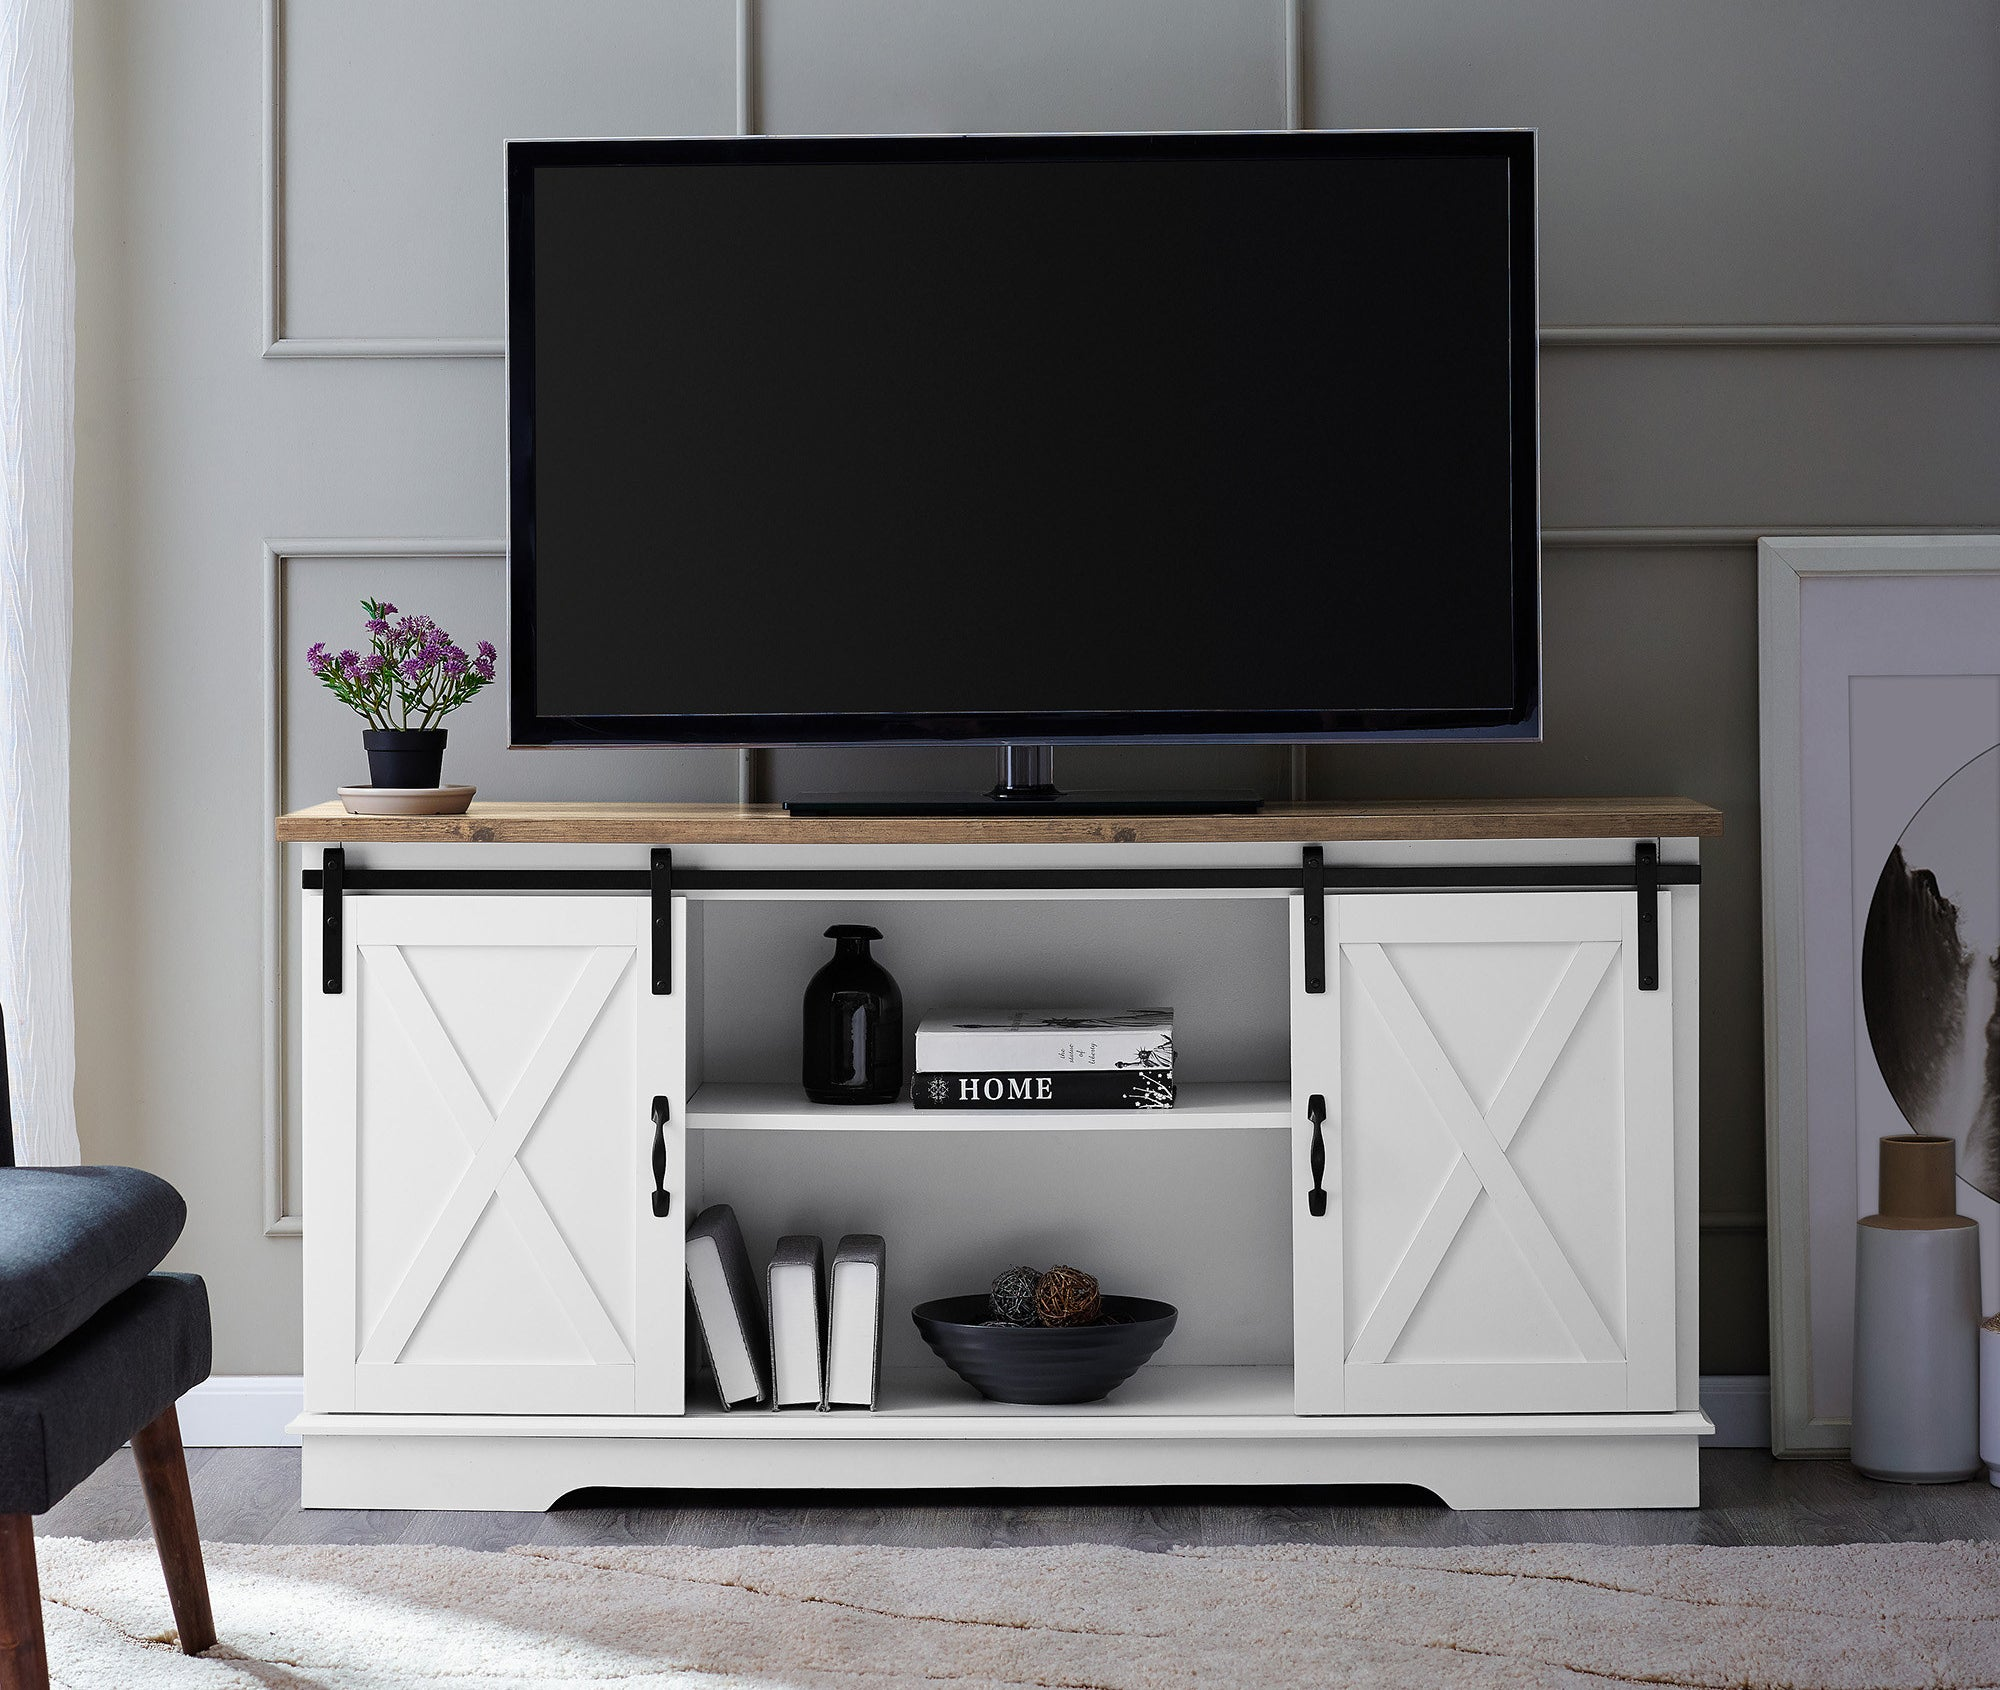 the white farmhouse style tv stand